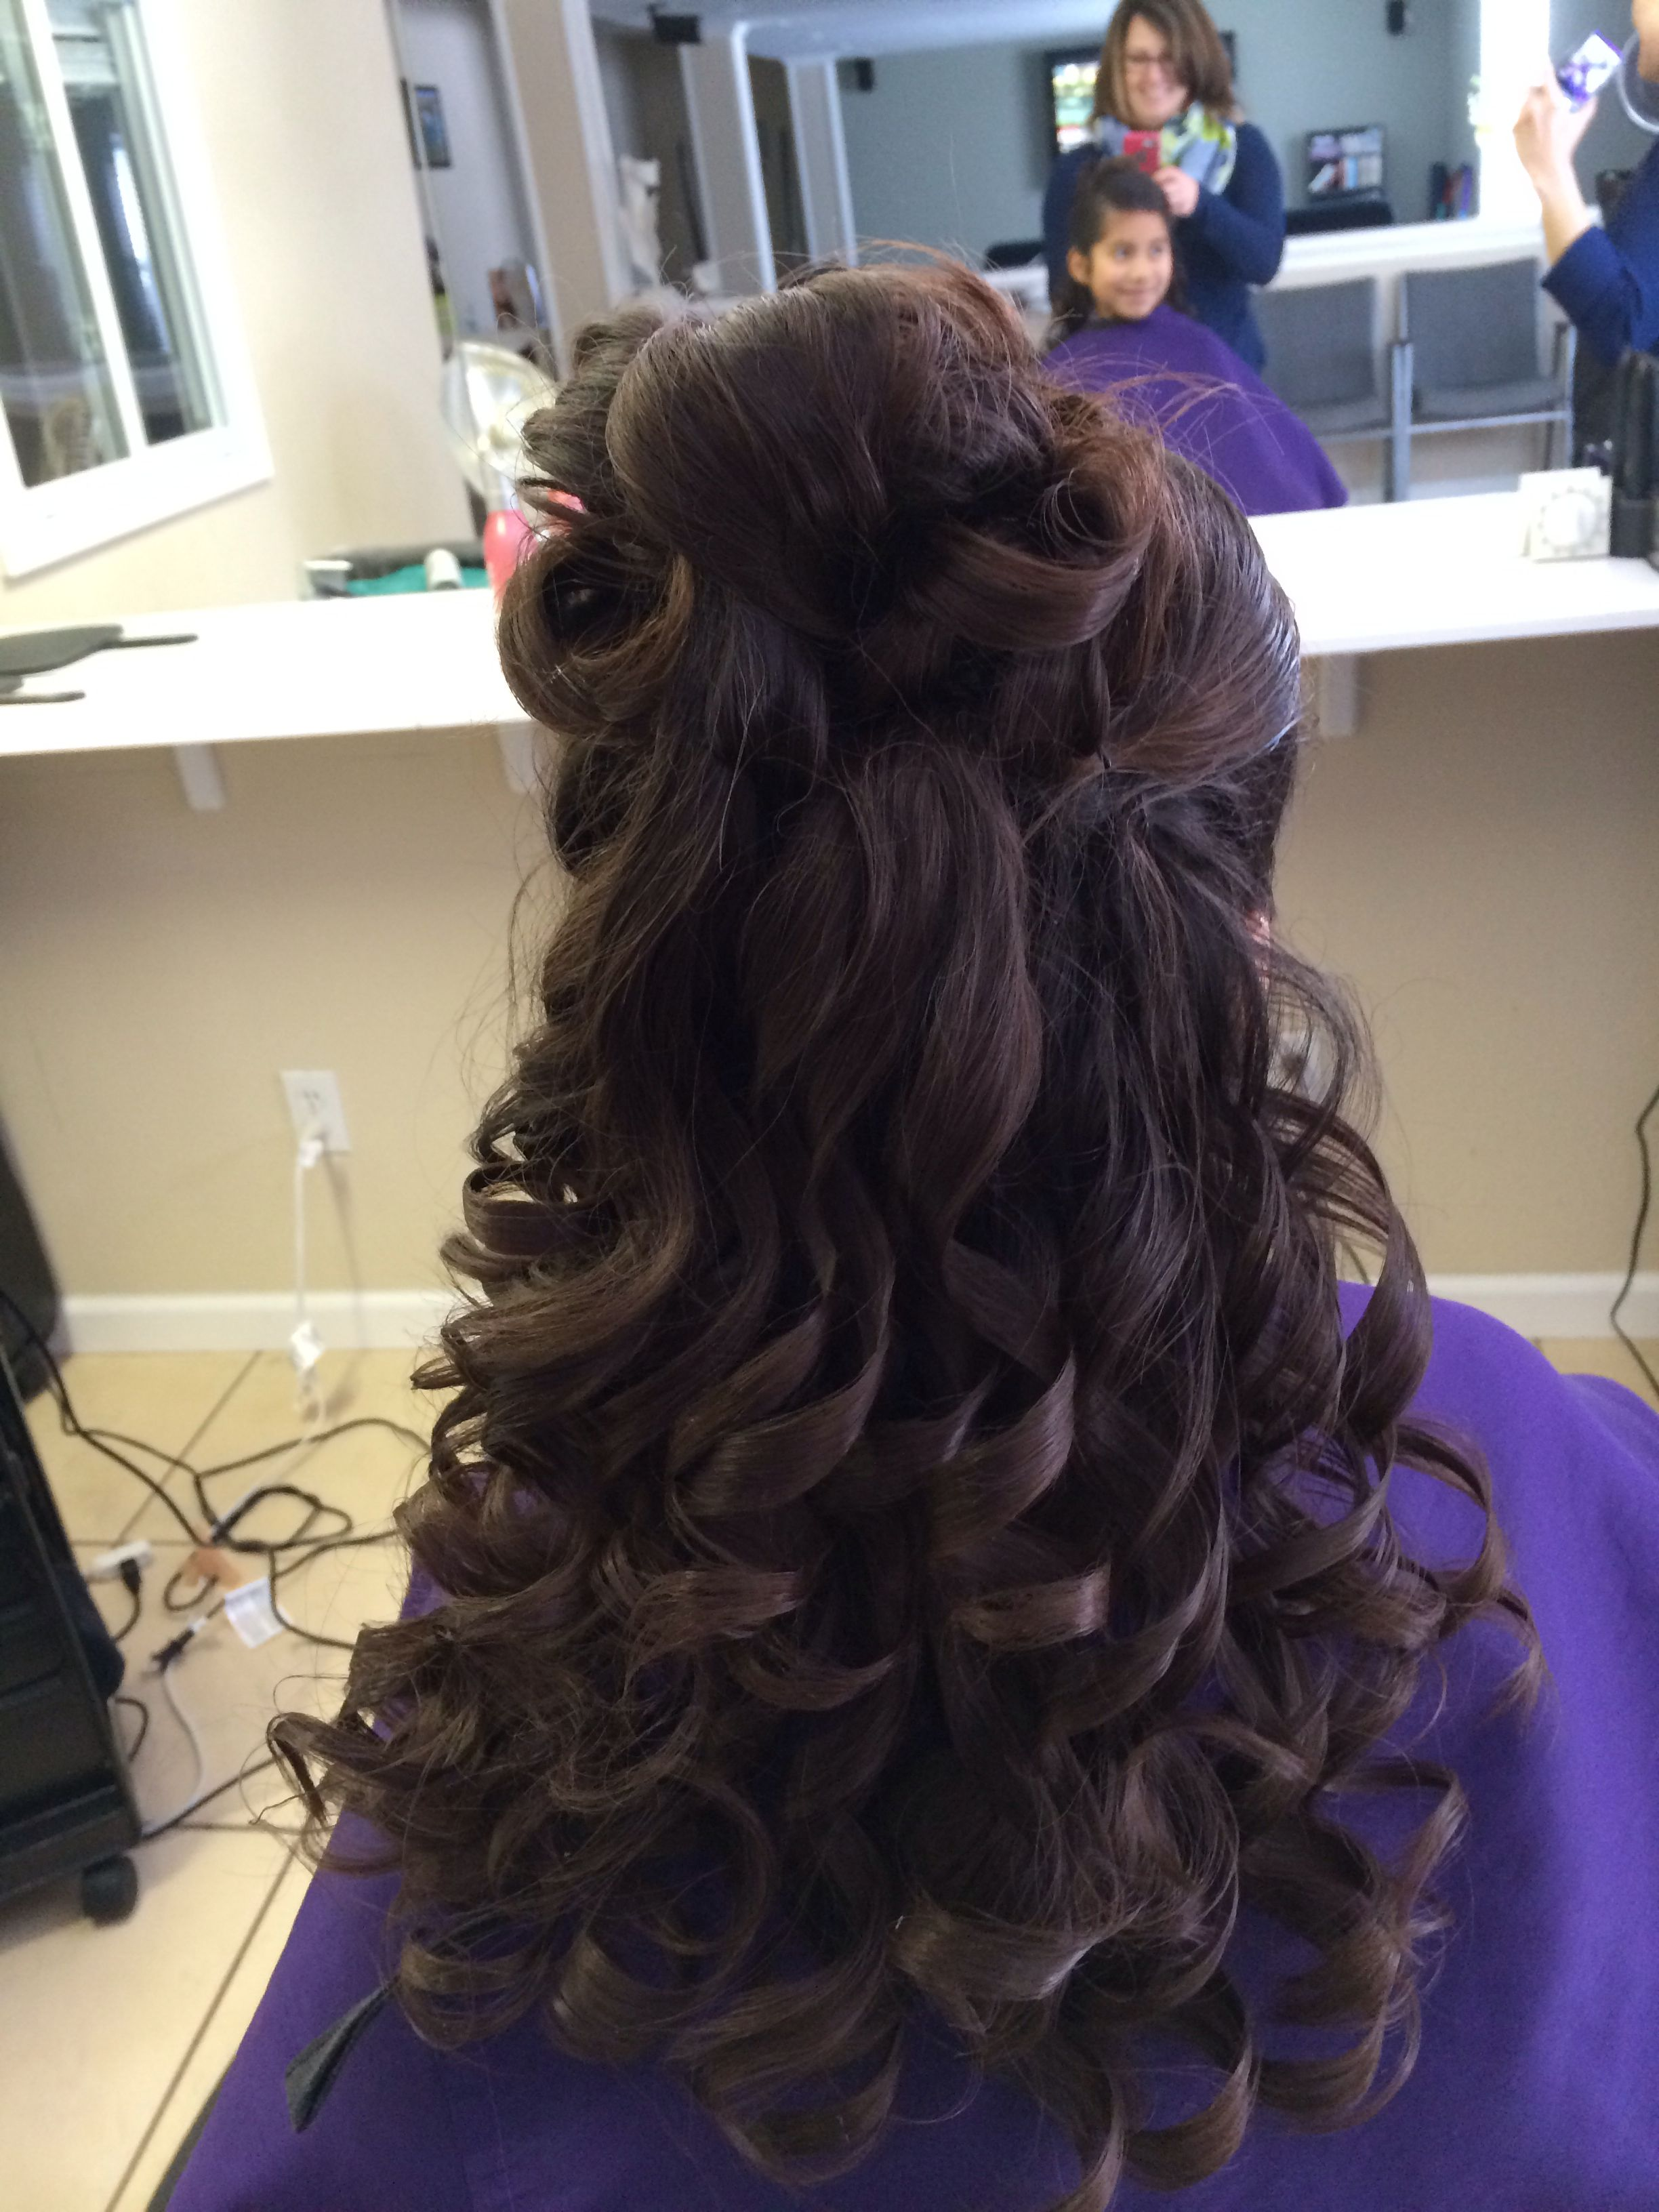 First Communion Hair Communion Hairstyles Hair Styles